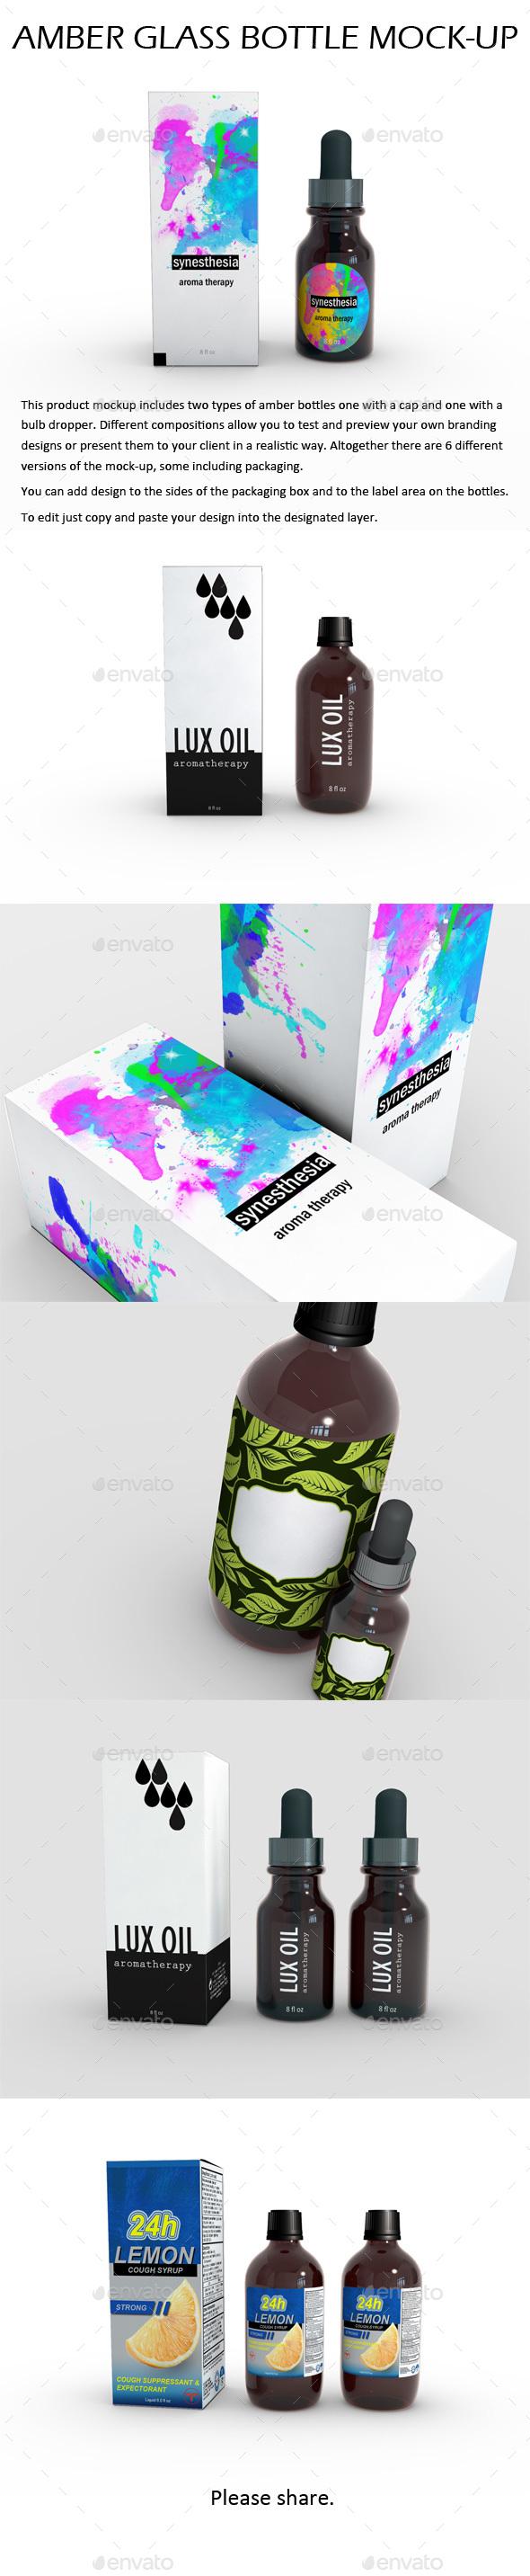 Amber Glass Bottle Mock-Up - Product Mock-Ups Graphics